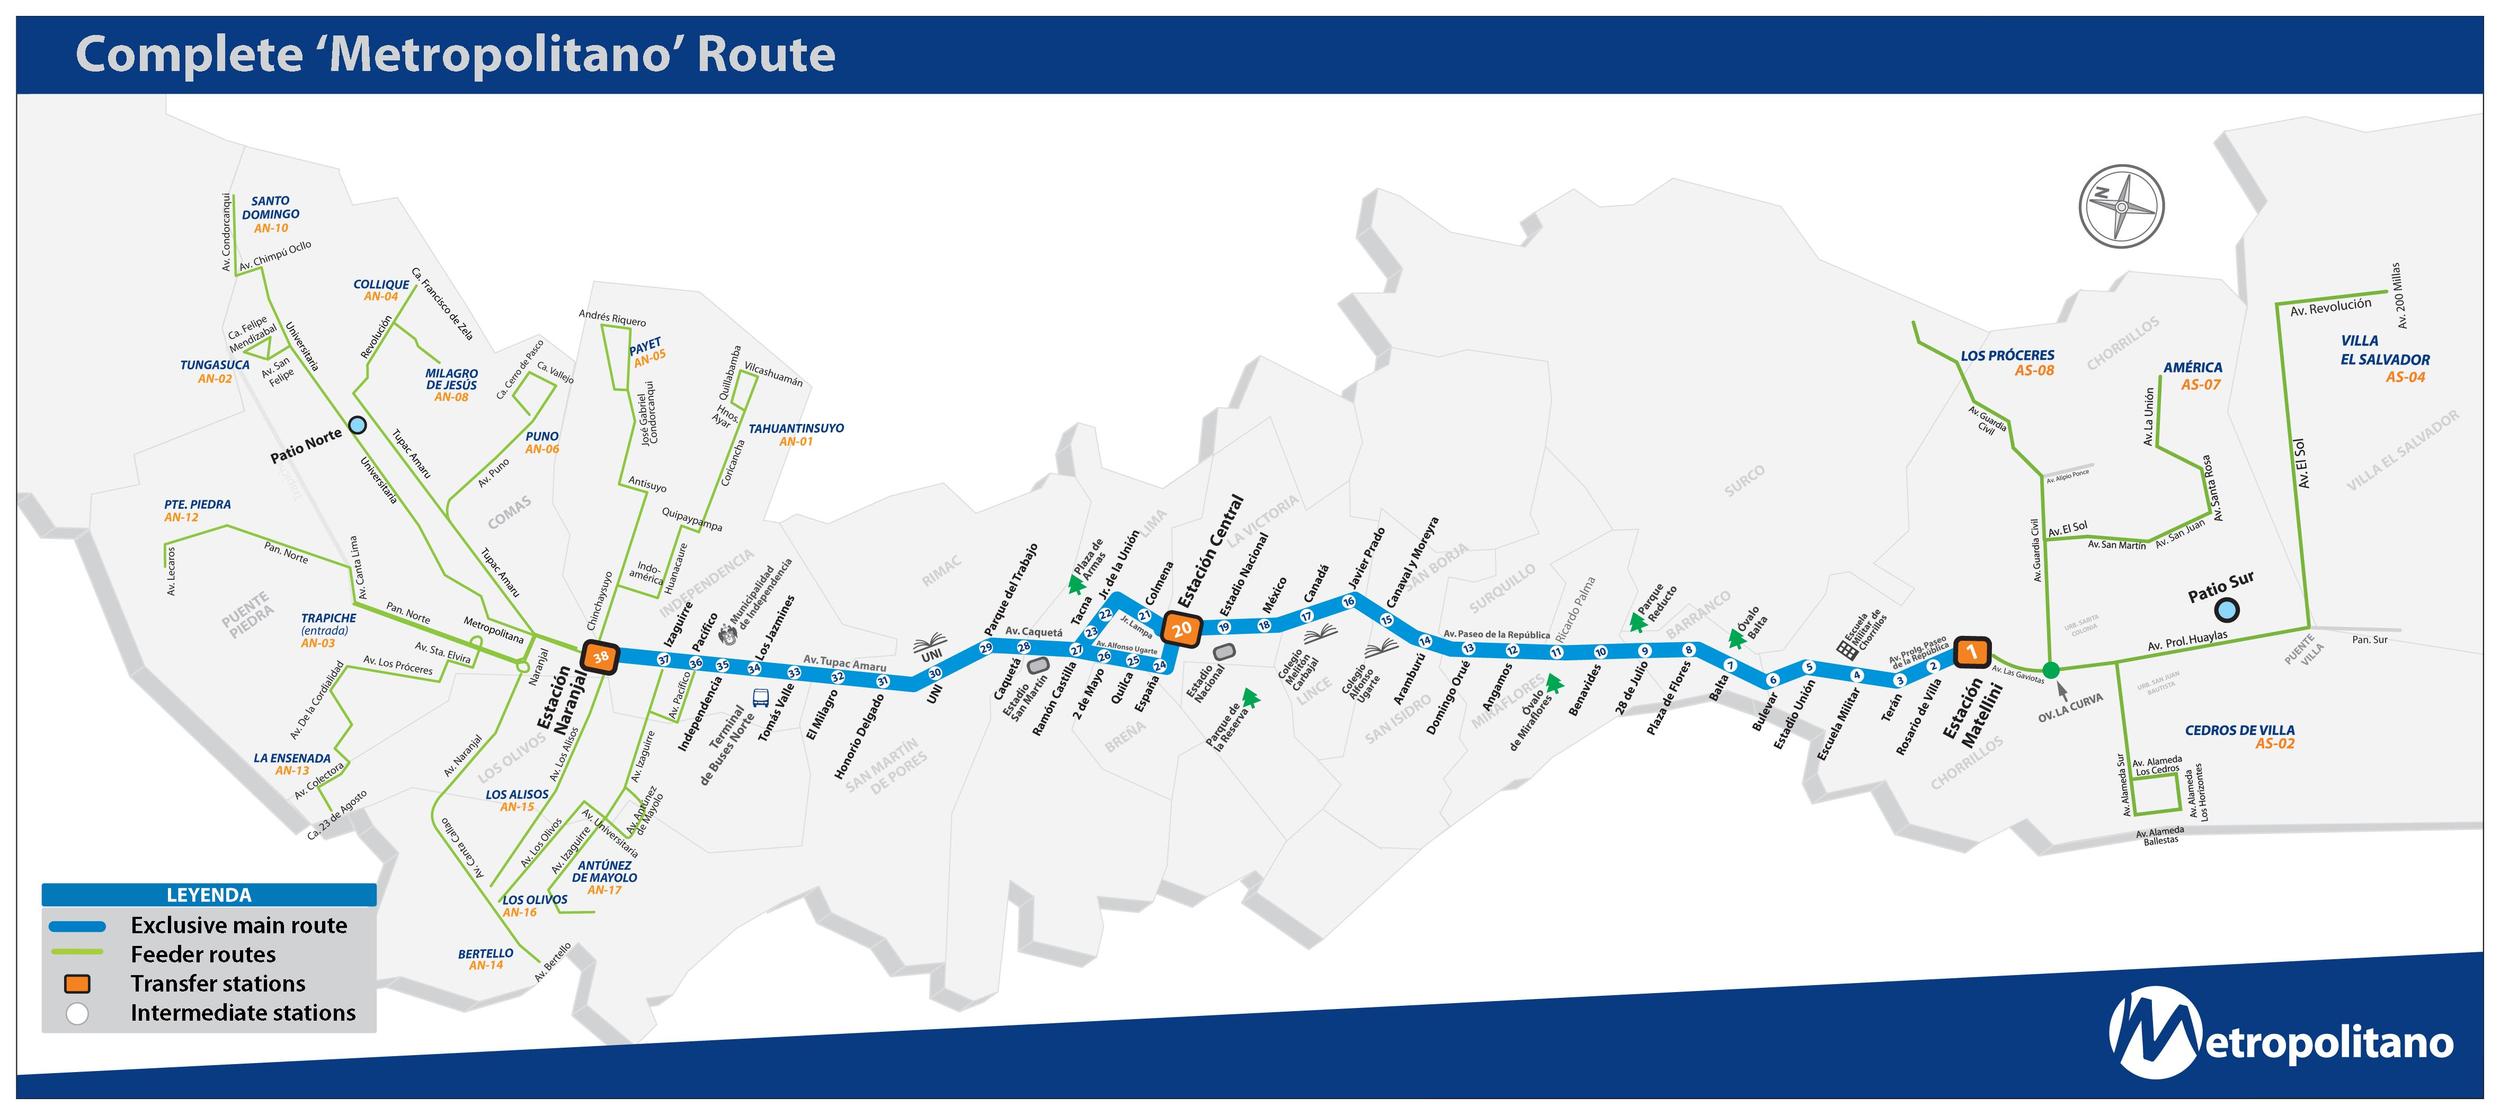 Figure 2 – Complete Metropolitano Route (Protransporte,2014)